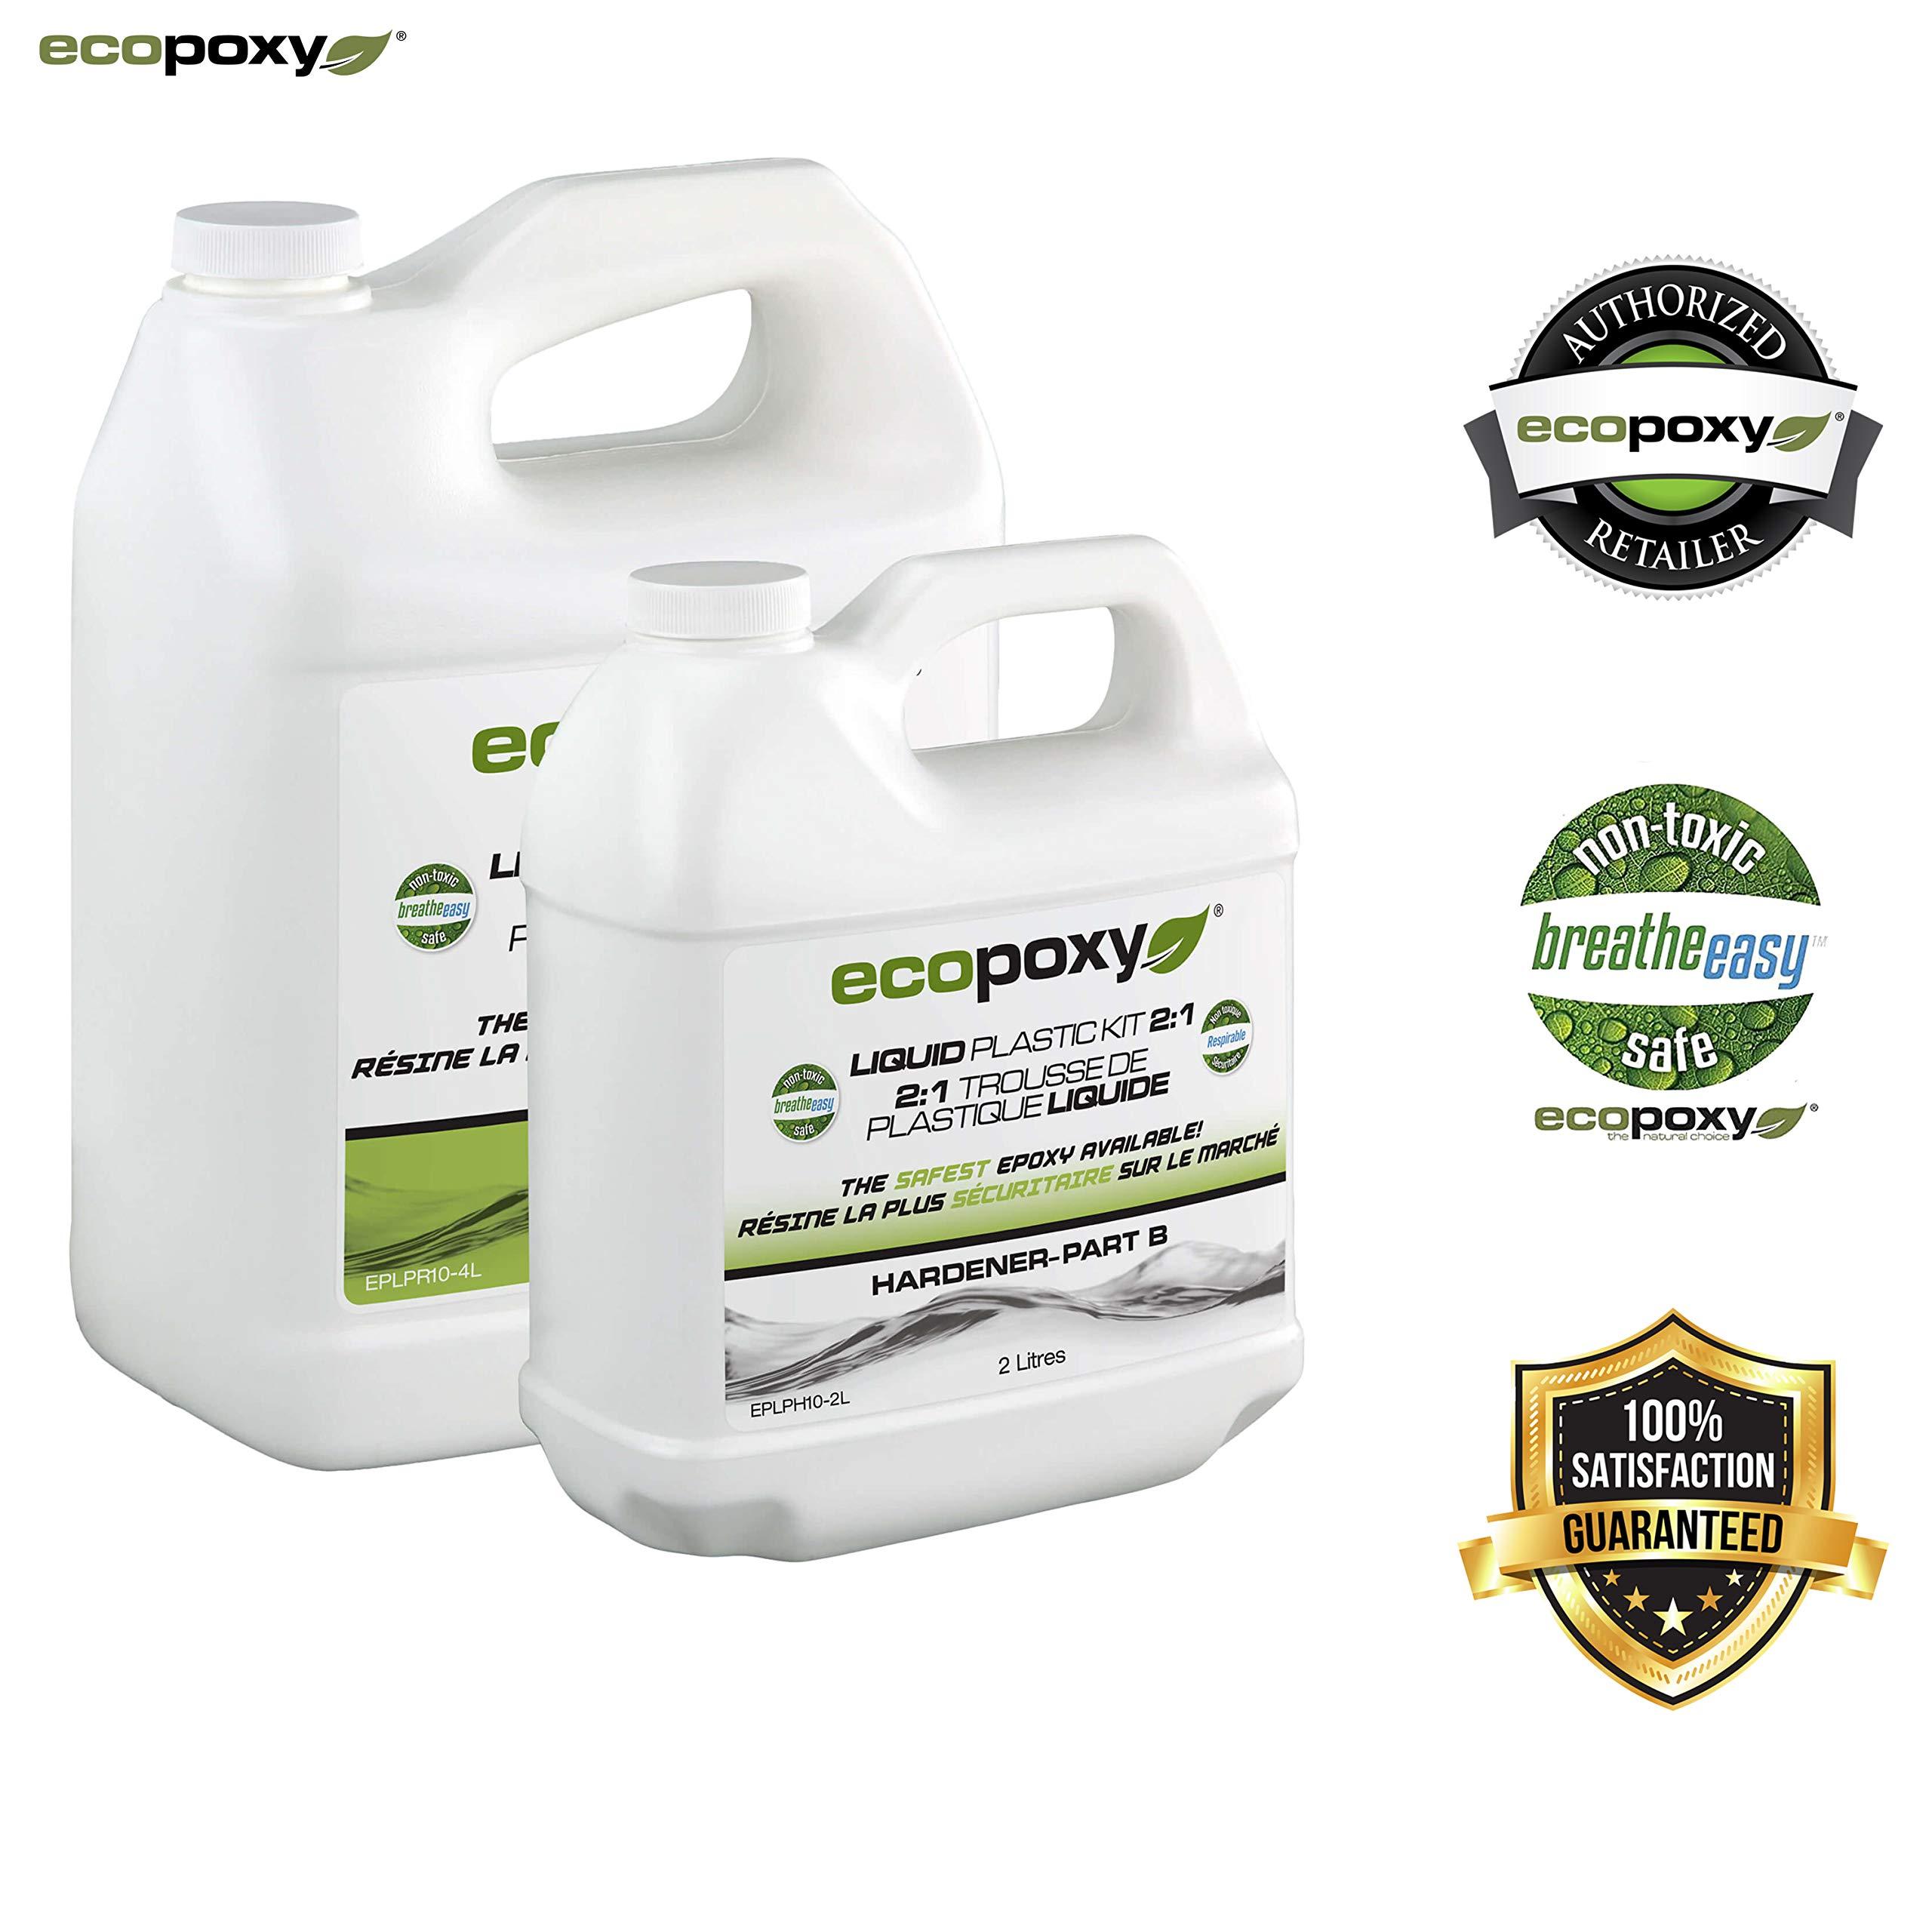 Ecopoxy | Epoxy Resin | Liquid Plastic 2:1 Ratio (6L (1.5 gal) kit)